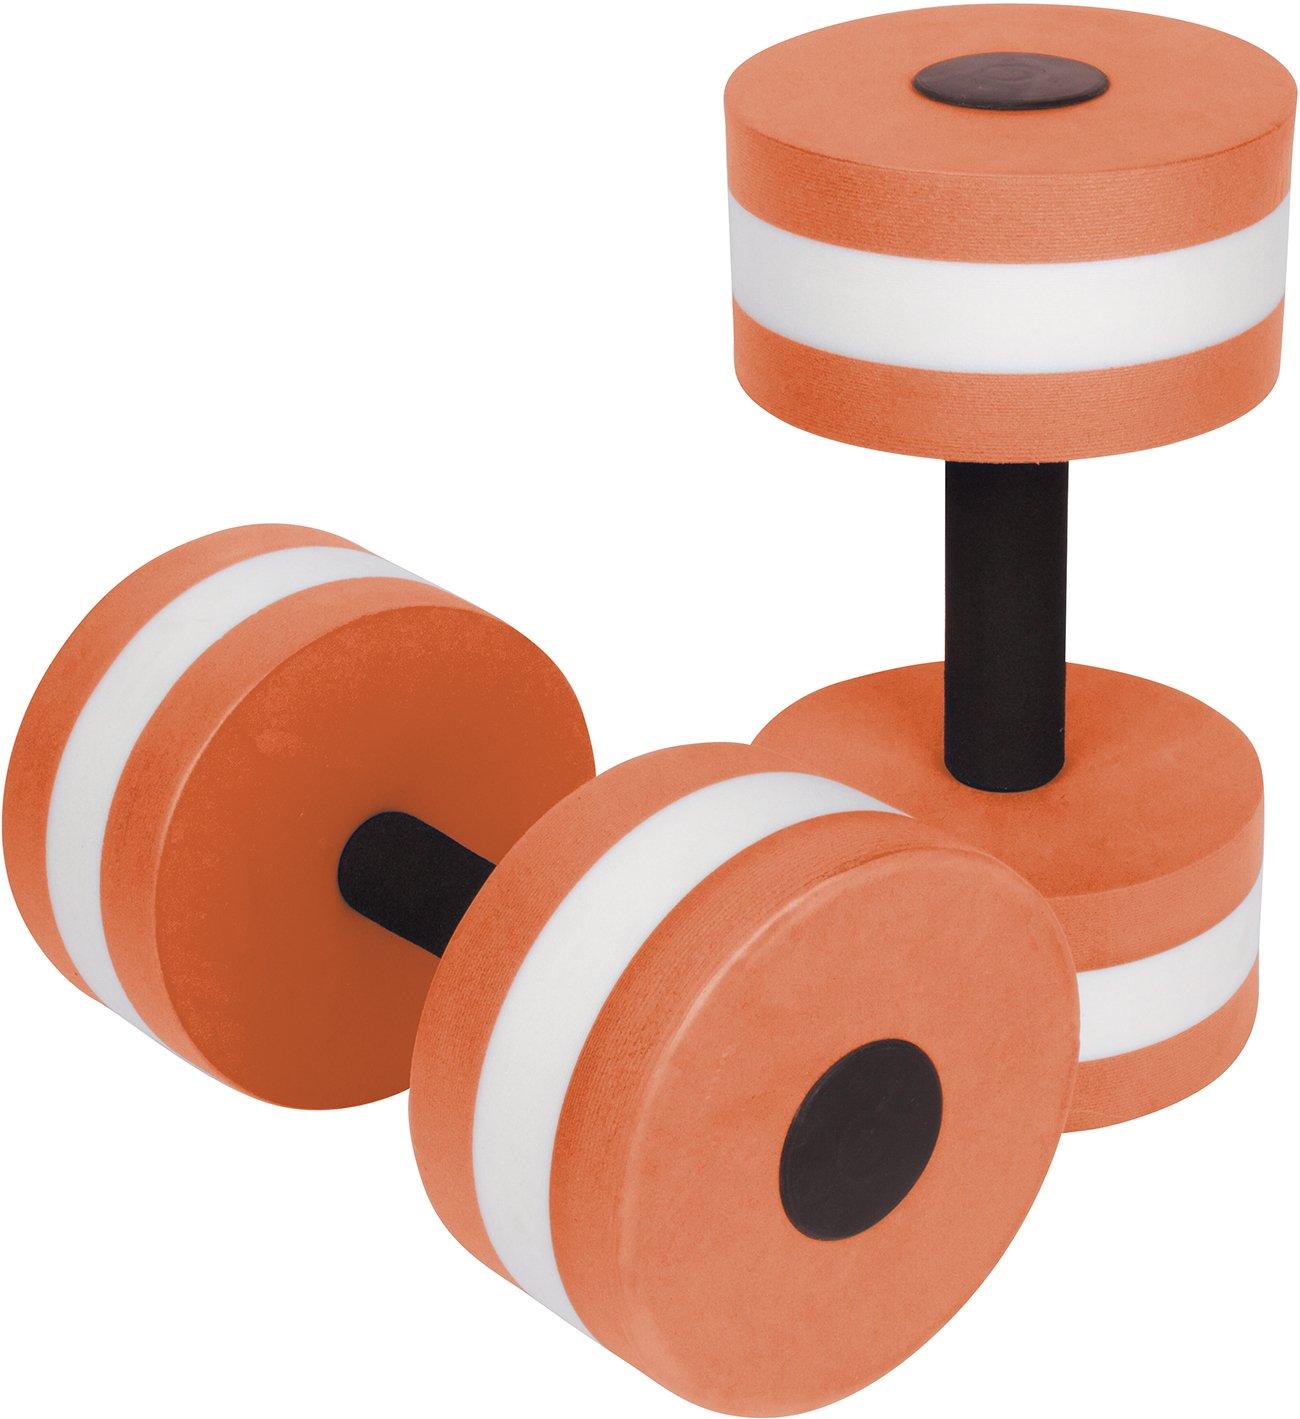 Trademark Innovations Aquatic Exercise Dumbells - Set of 2 Foam - for Water Aerobics (Orange)